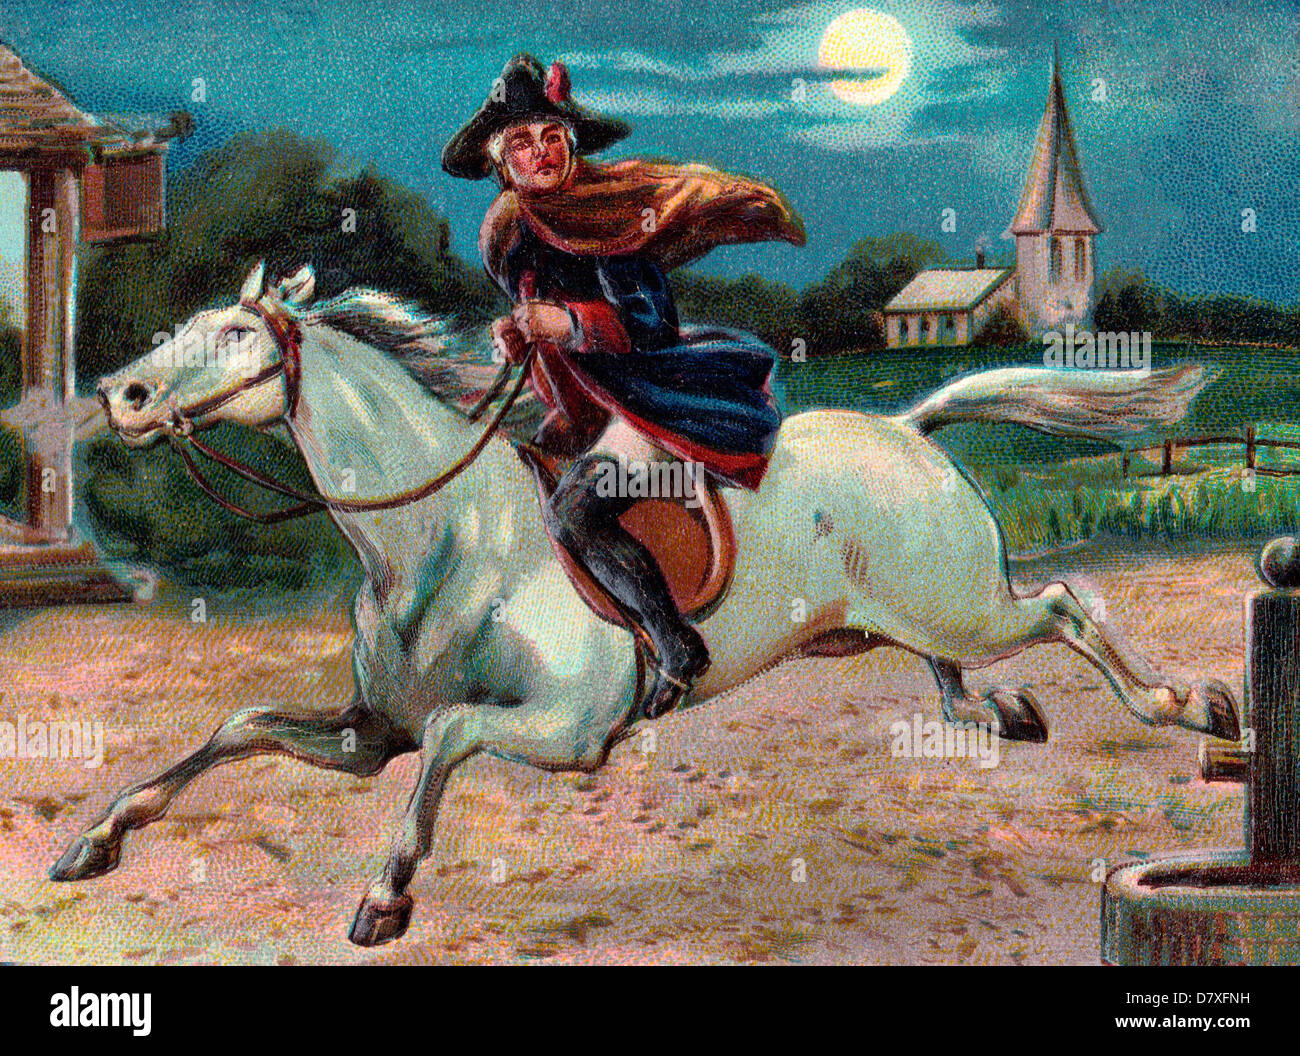 Paul Revere S Ride April 18 Stock Photo Royalty